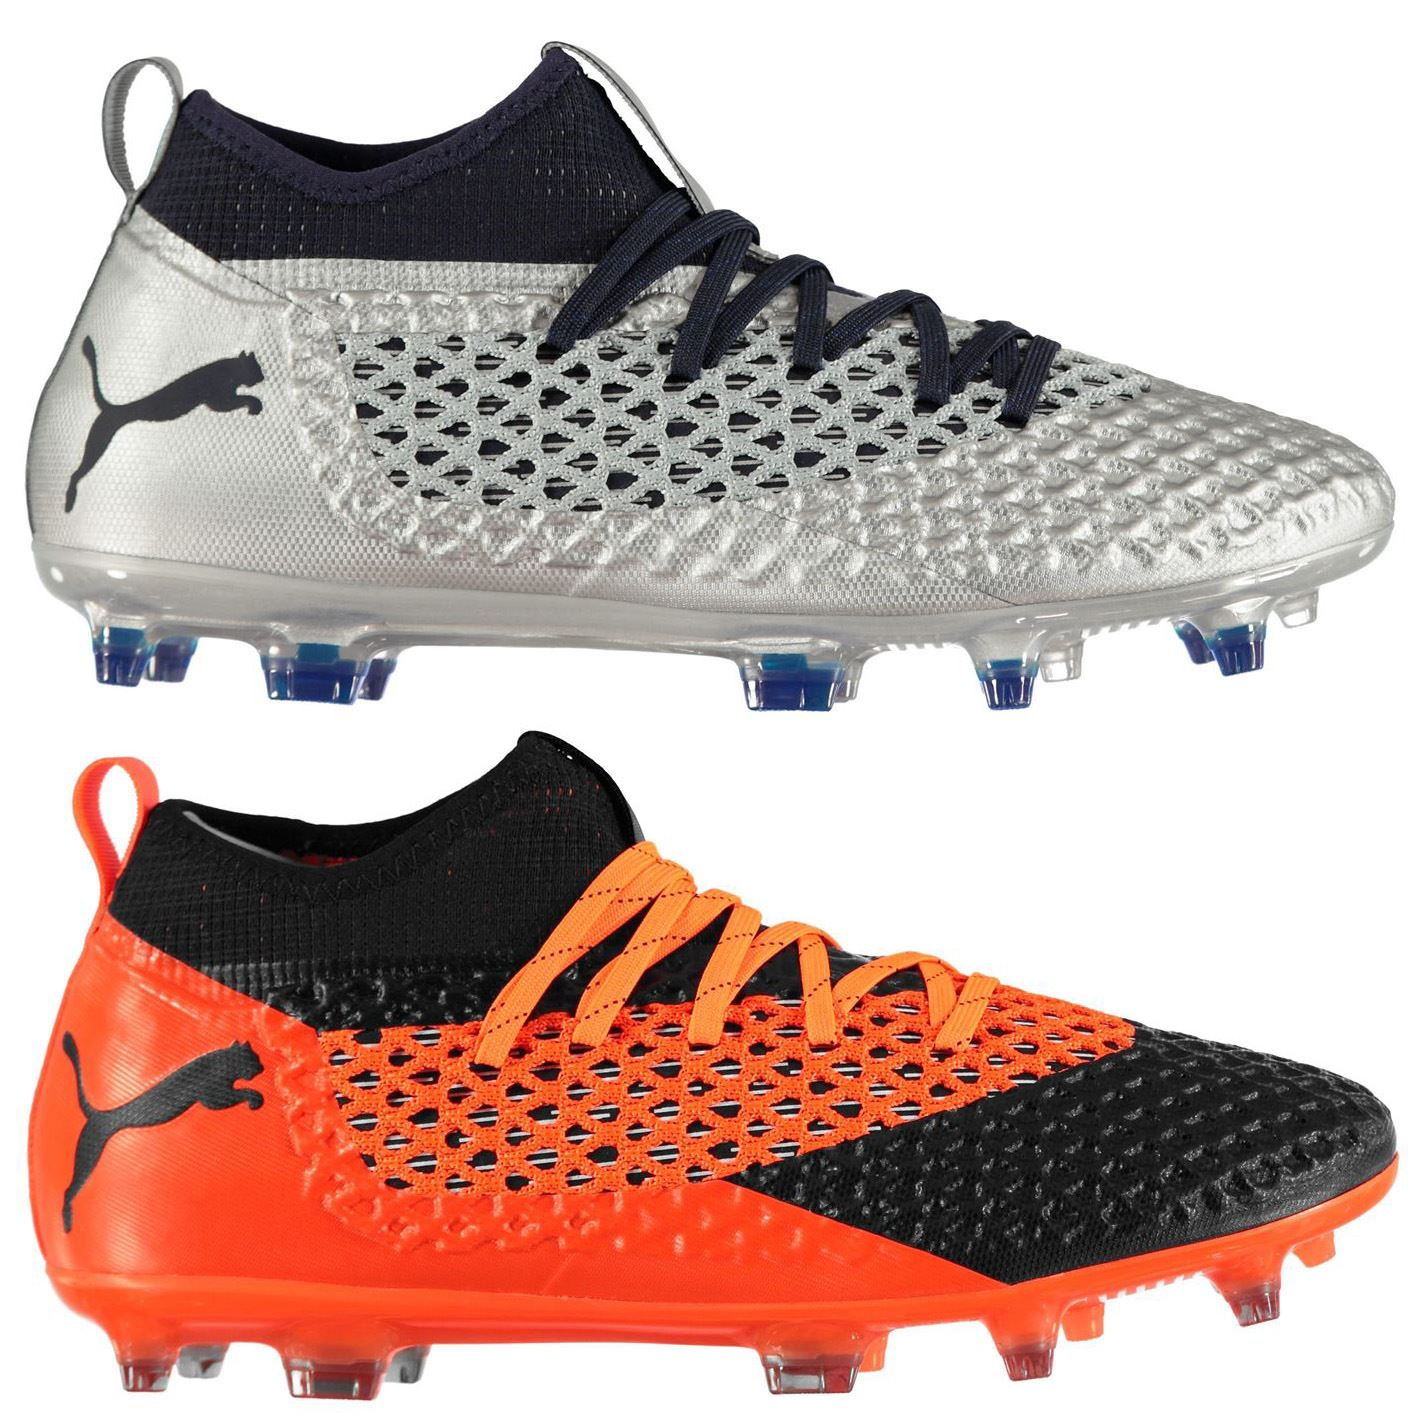 ... Puma Future 2.2 FG Firm Ground Football Boots Mens Soccer Shoes Cleats  ... cb0a8af9e